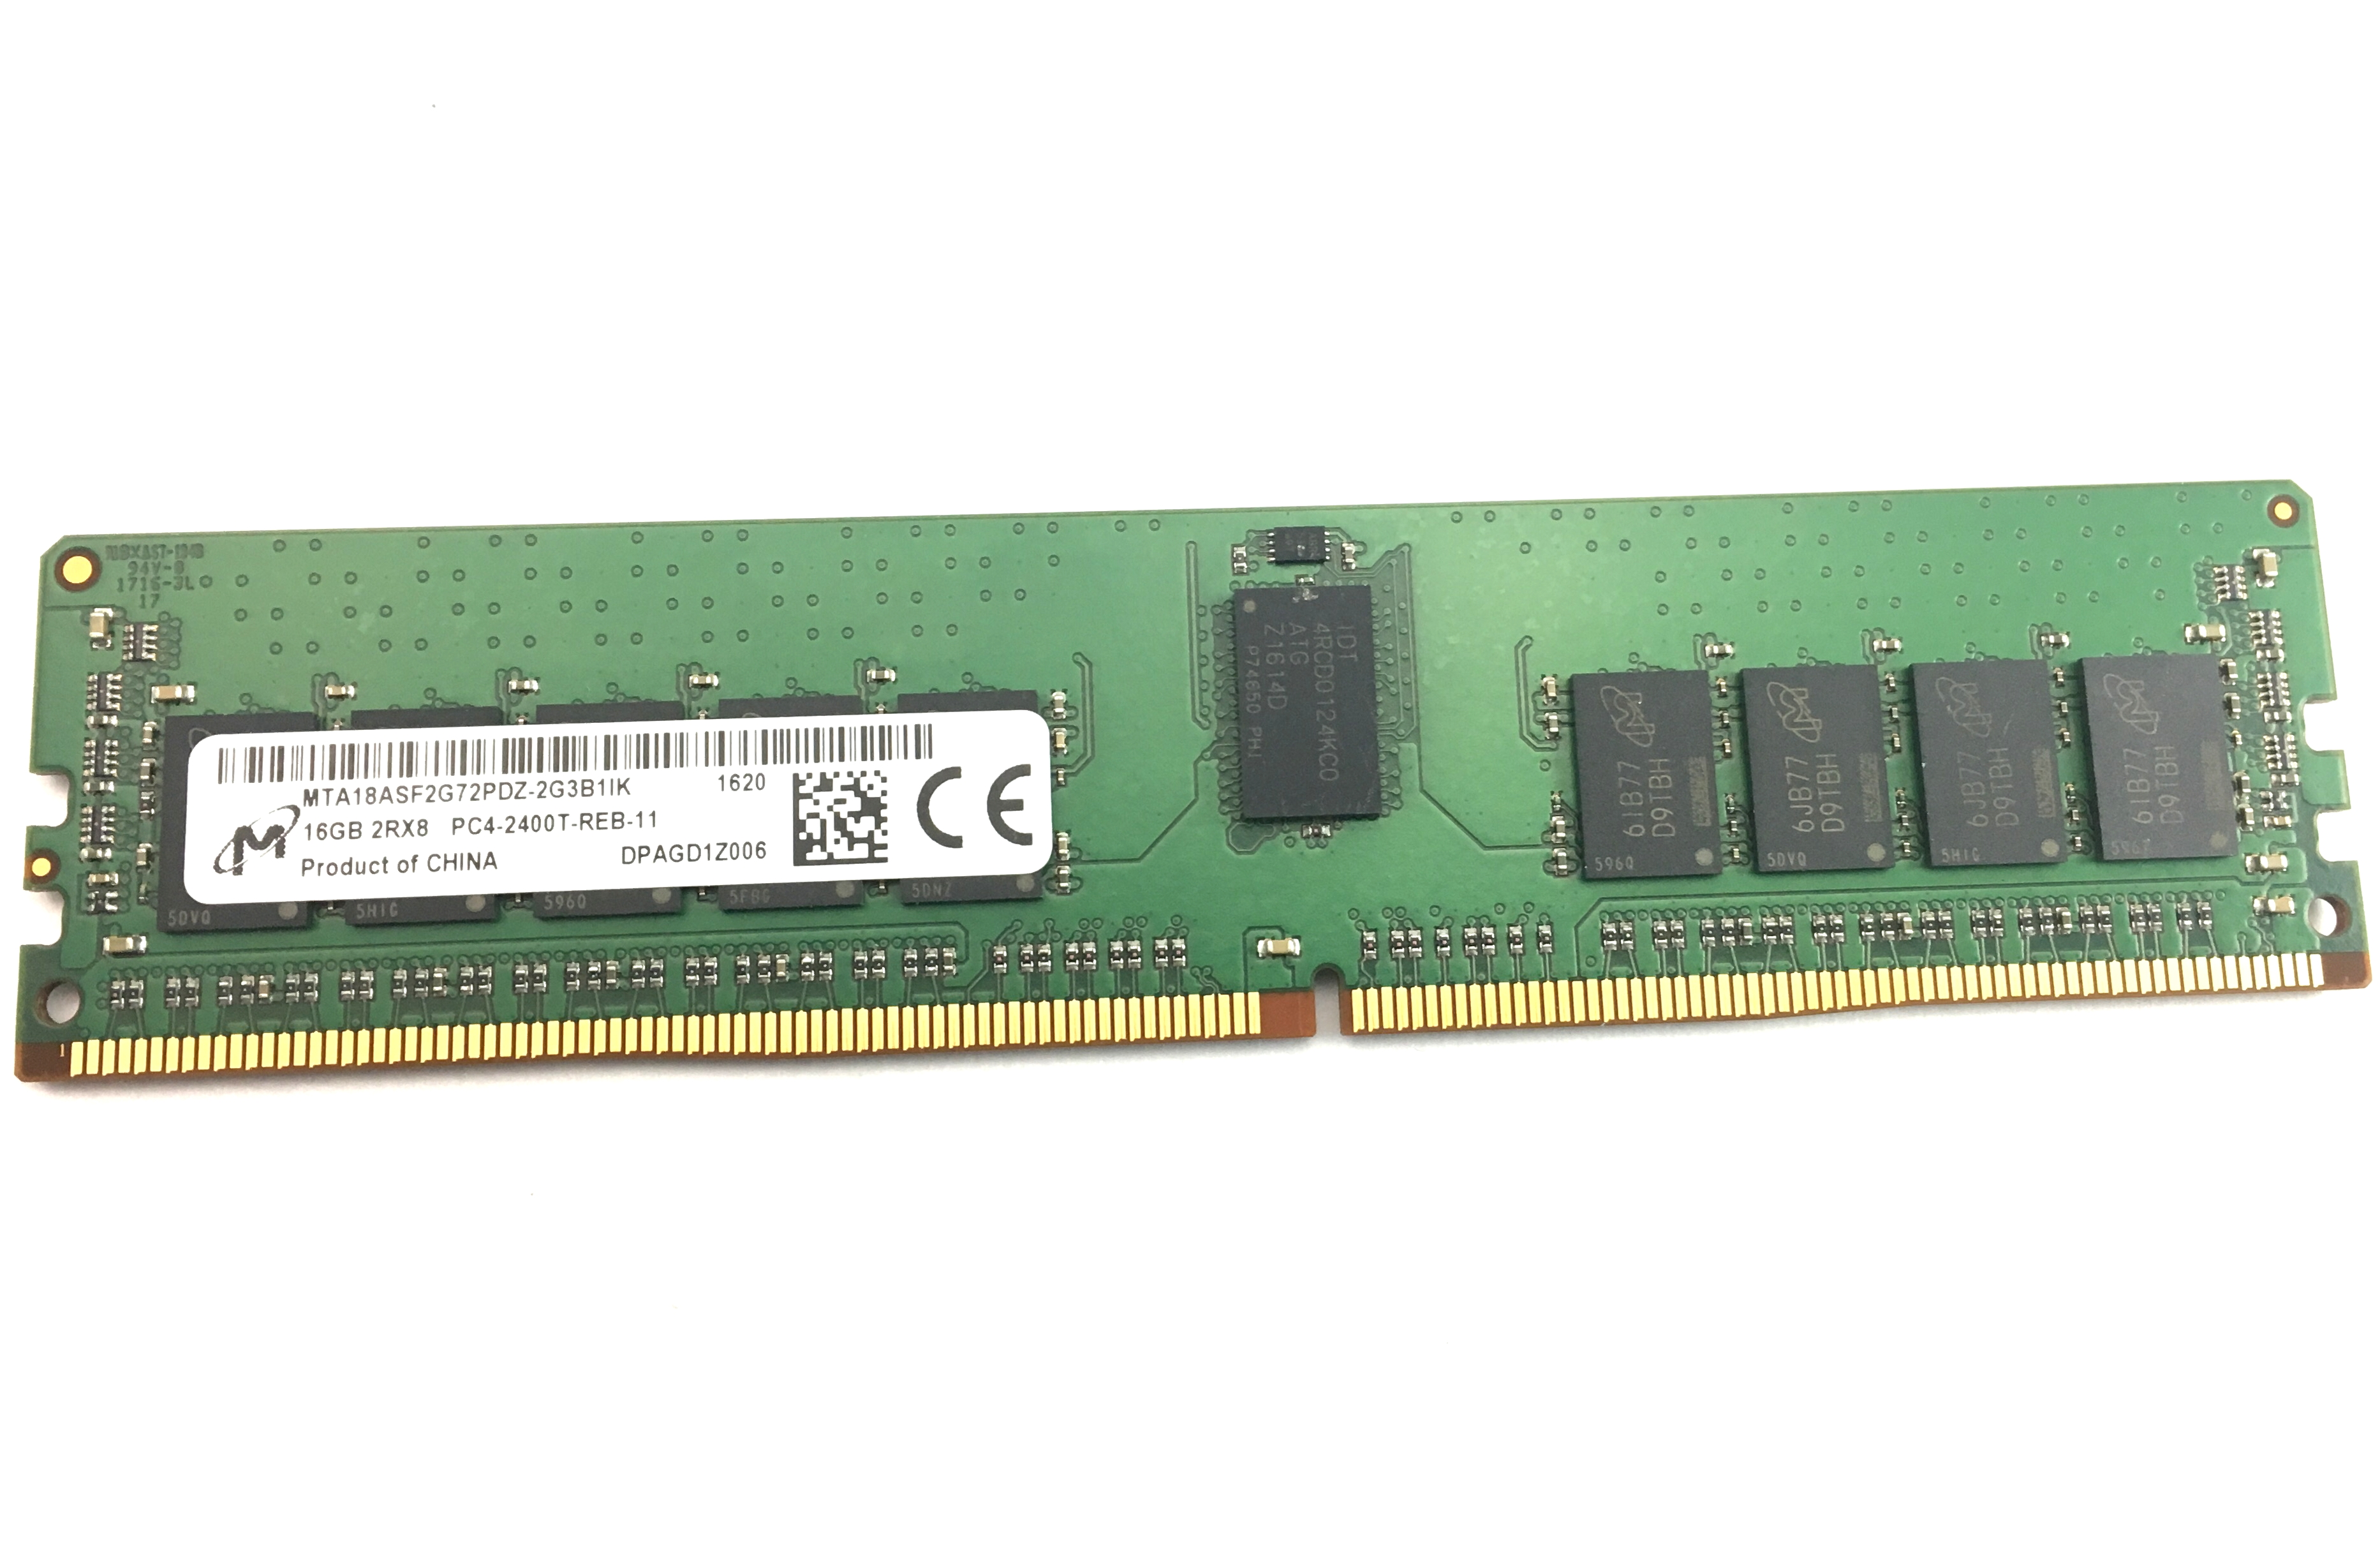 Micron 16GB 2Rx8 PC4-19200 DDR4-2400MHz ECC Registered Memory (MTA18ASF2G72PDZ-2G3B1)